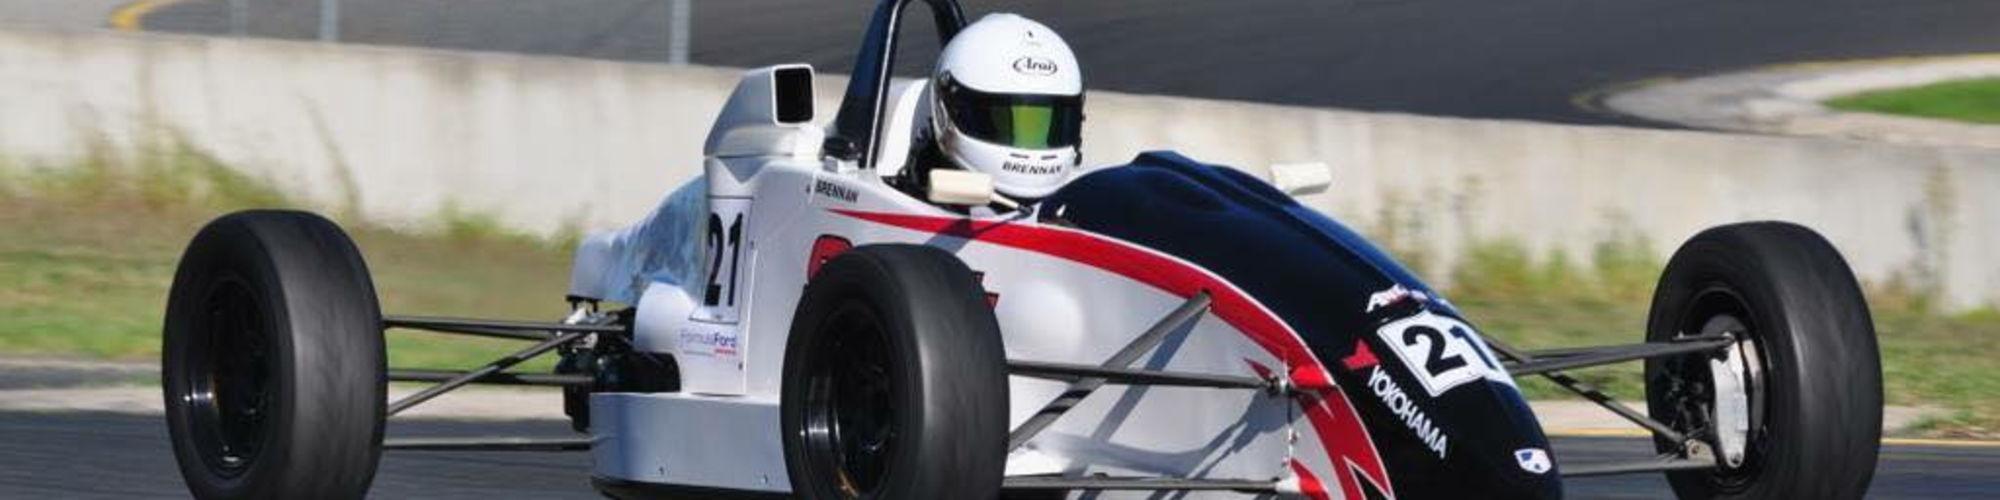 Anglo Australian Motorsport cover image